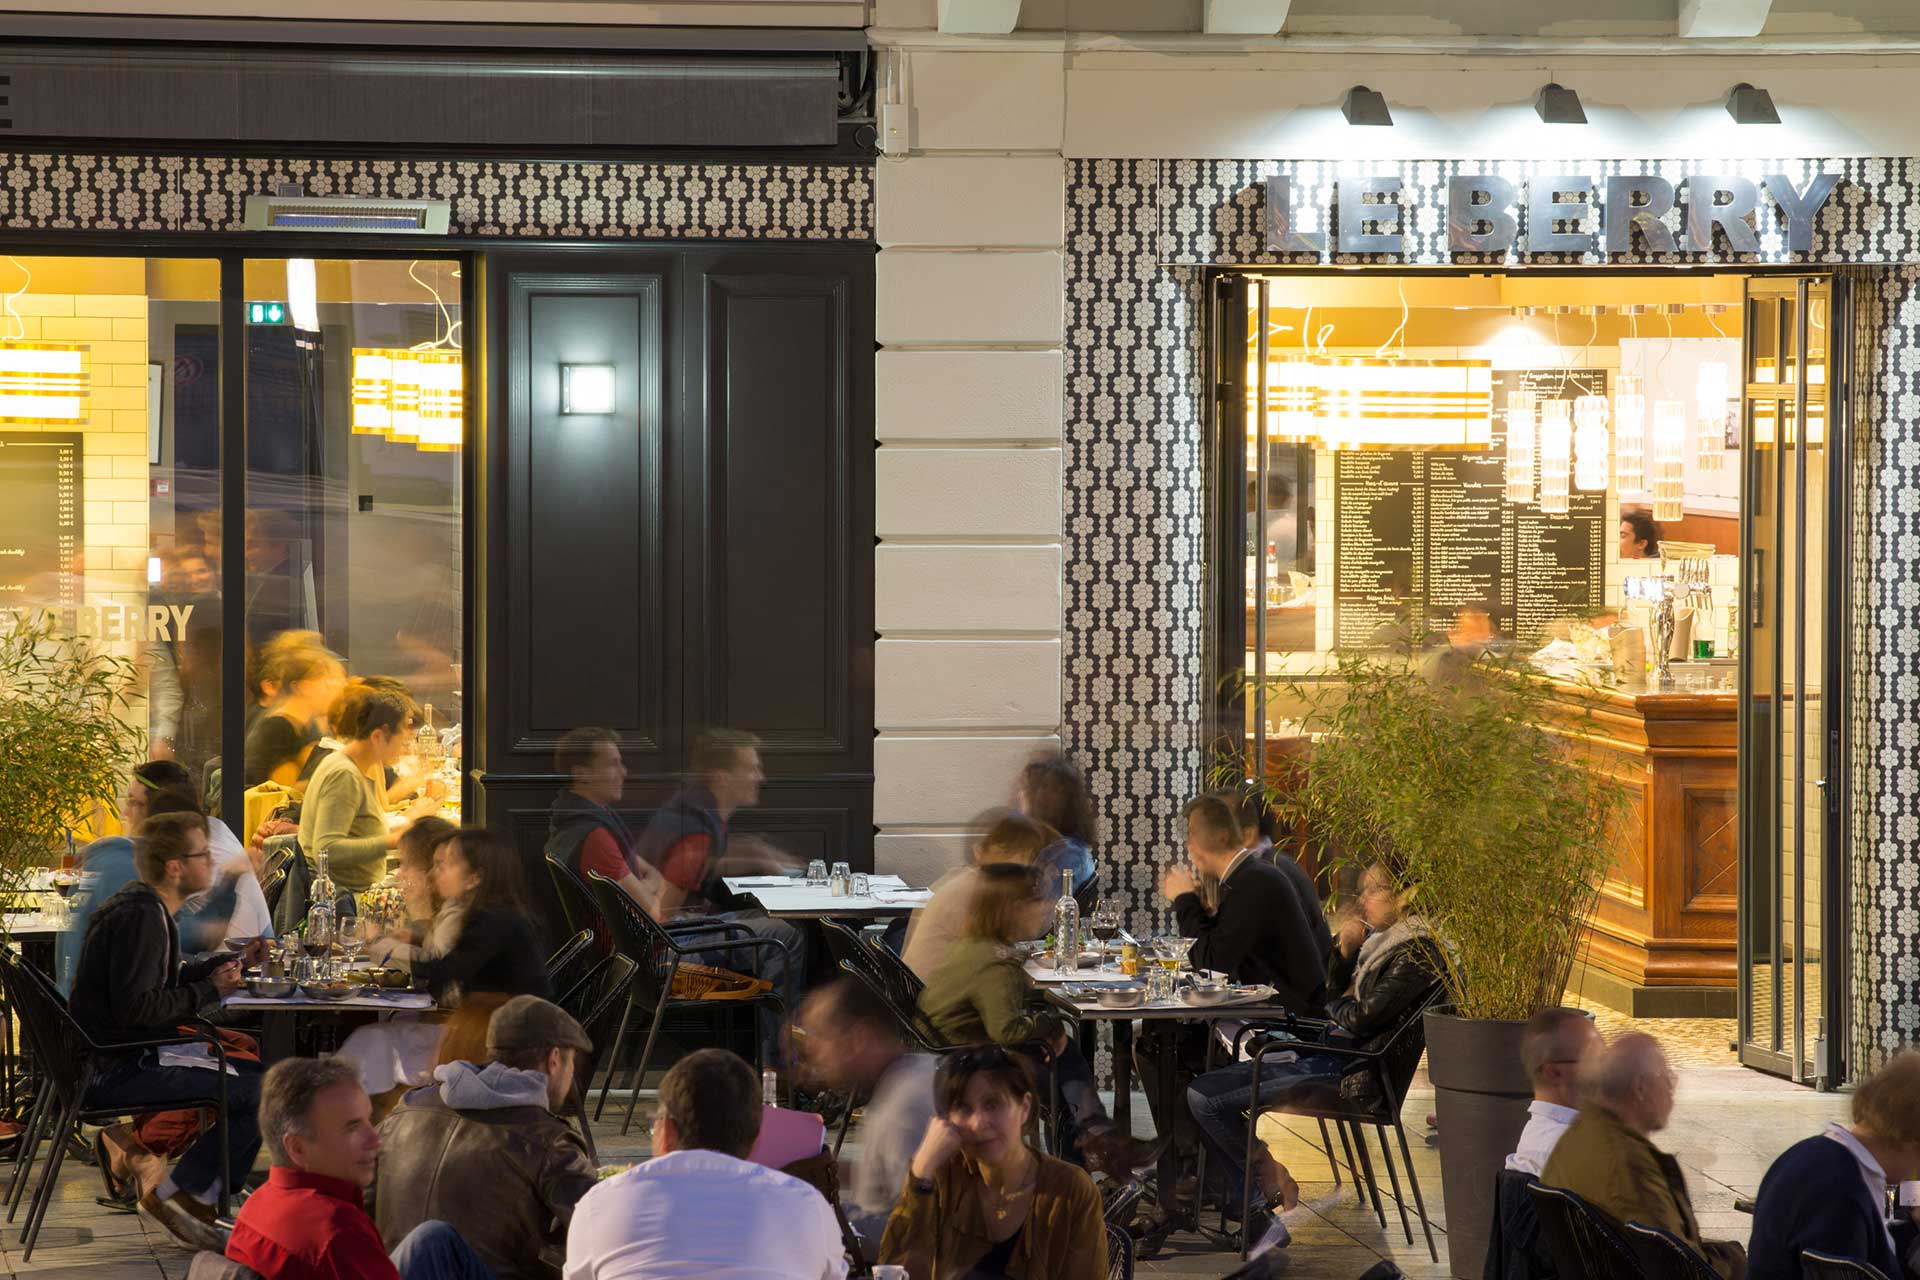 Brasserie Pau, Cuisine maison Pau, Reservation restaurant Pau, Restaurant centre ville Pau, Restaurant Pau